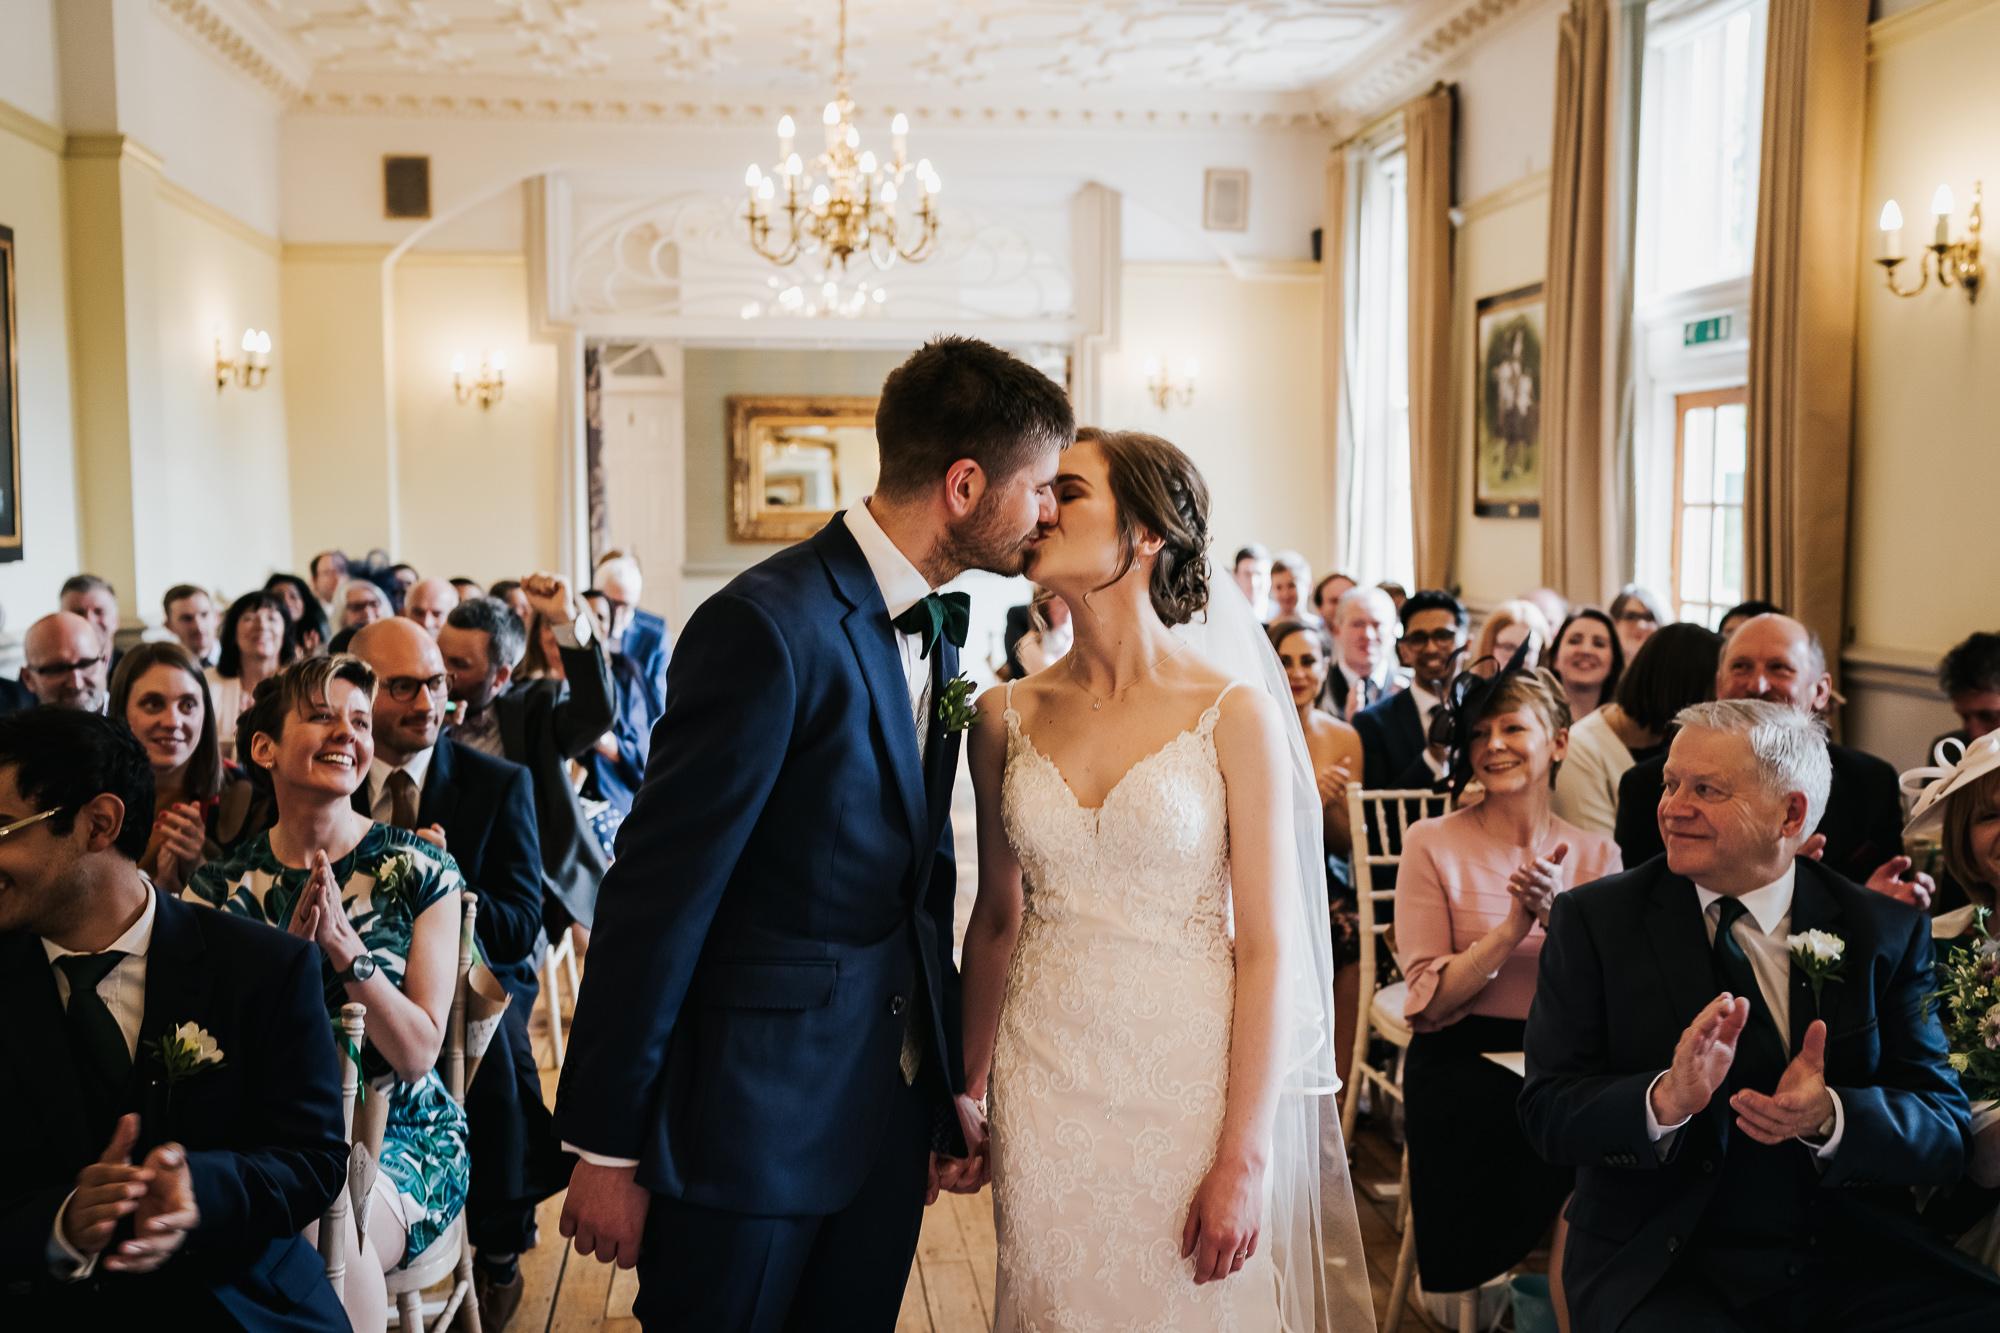 Nunsmere Hall Hotel Wedding photograhpy in cheshire wedding photographer (19 of 42).jpg